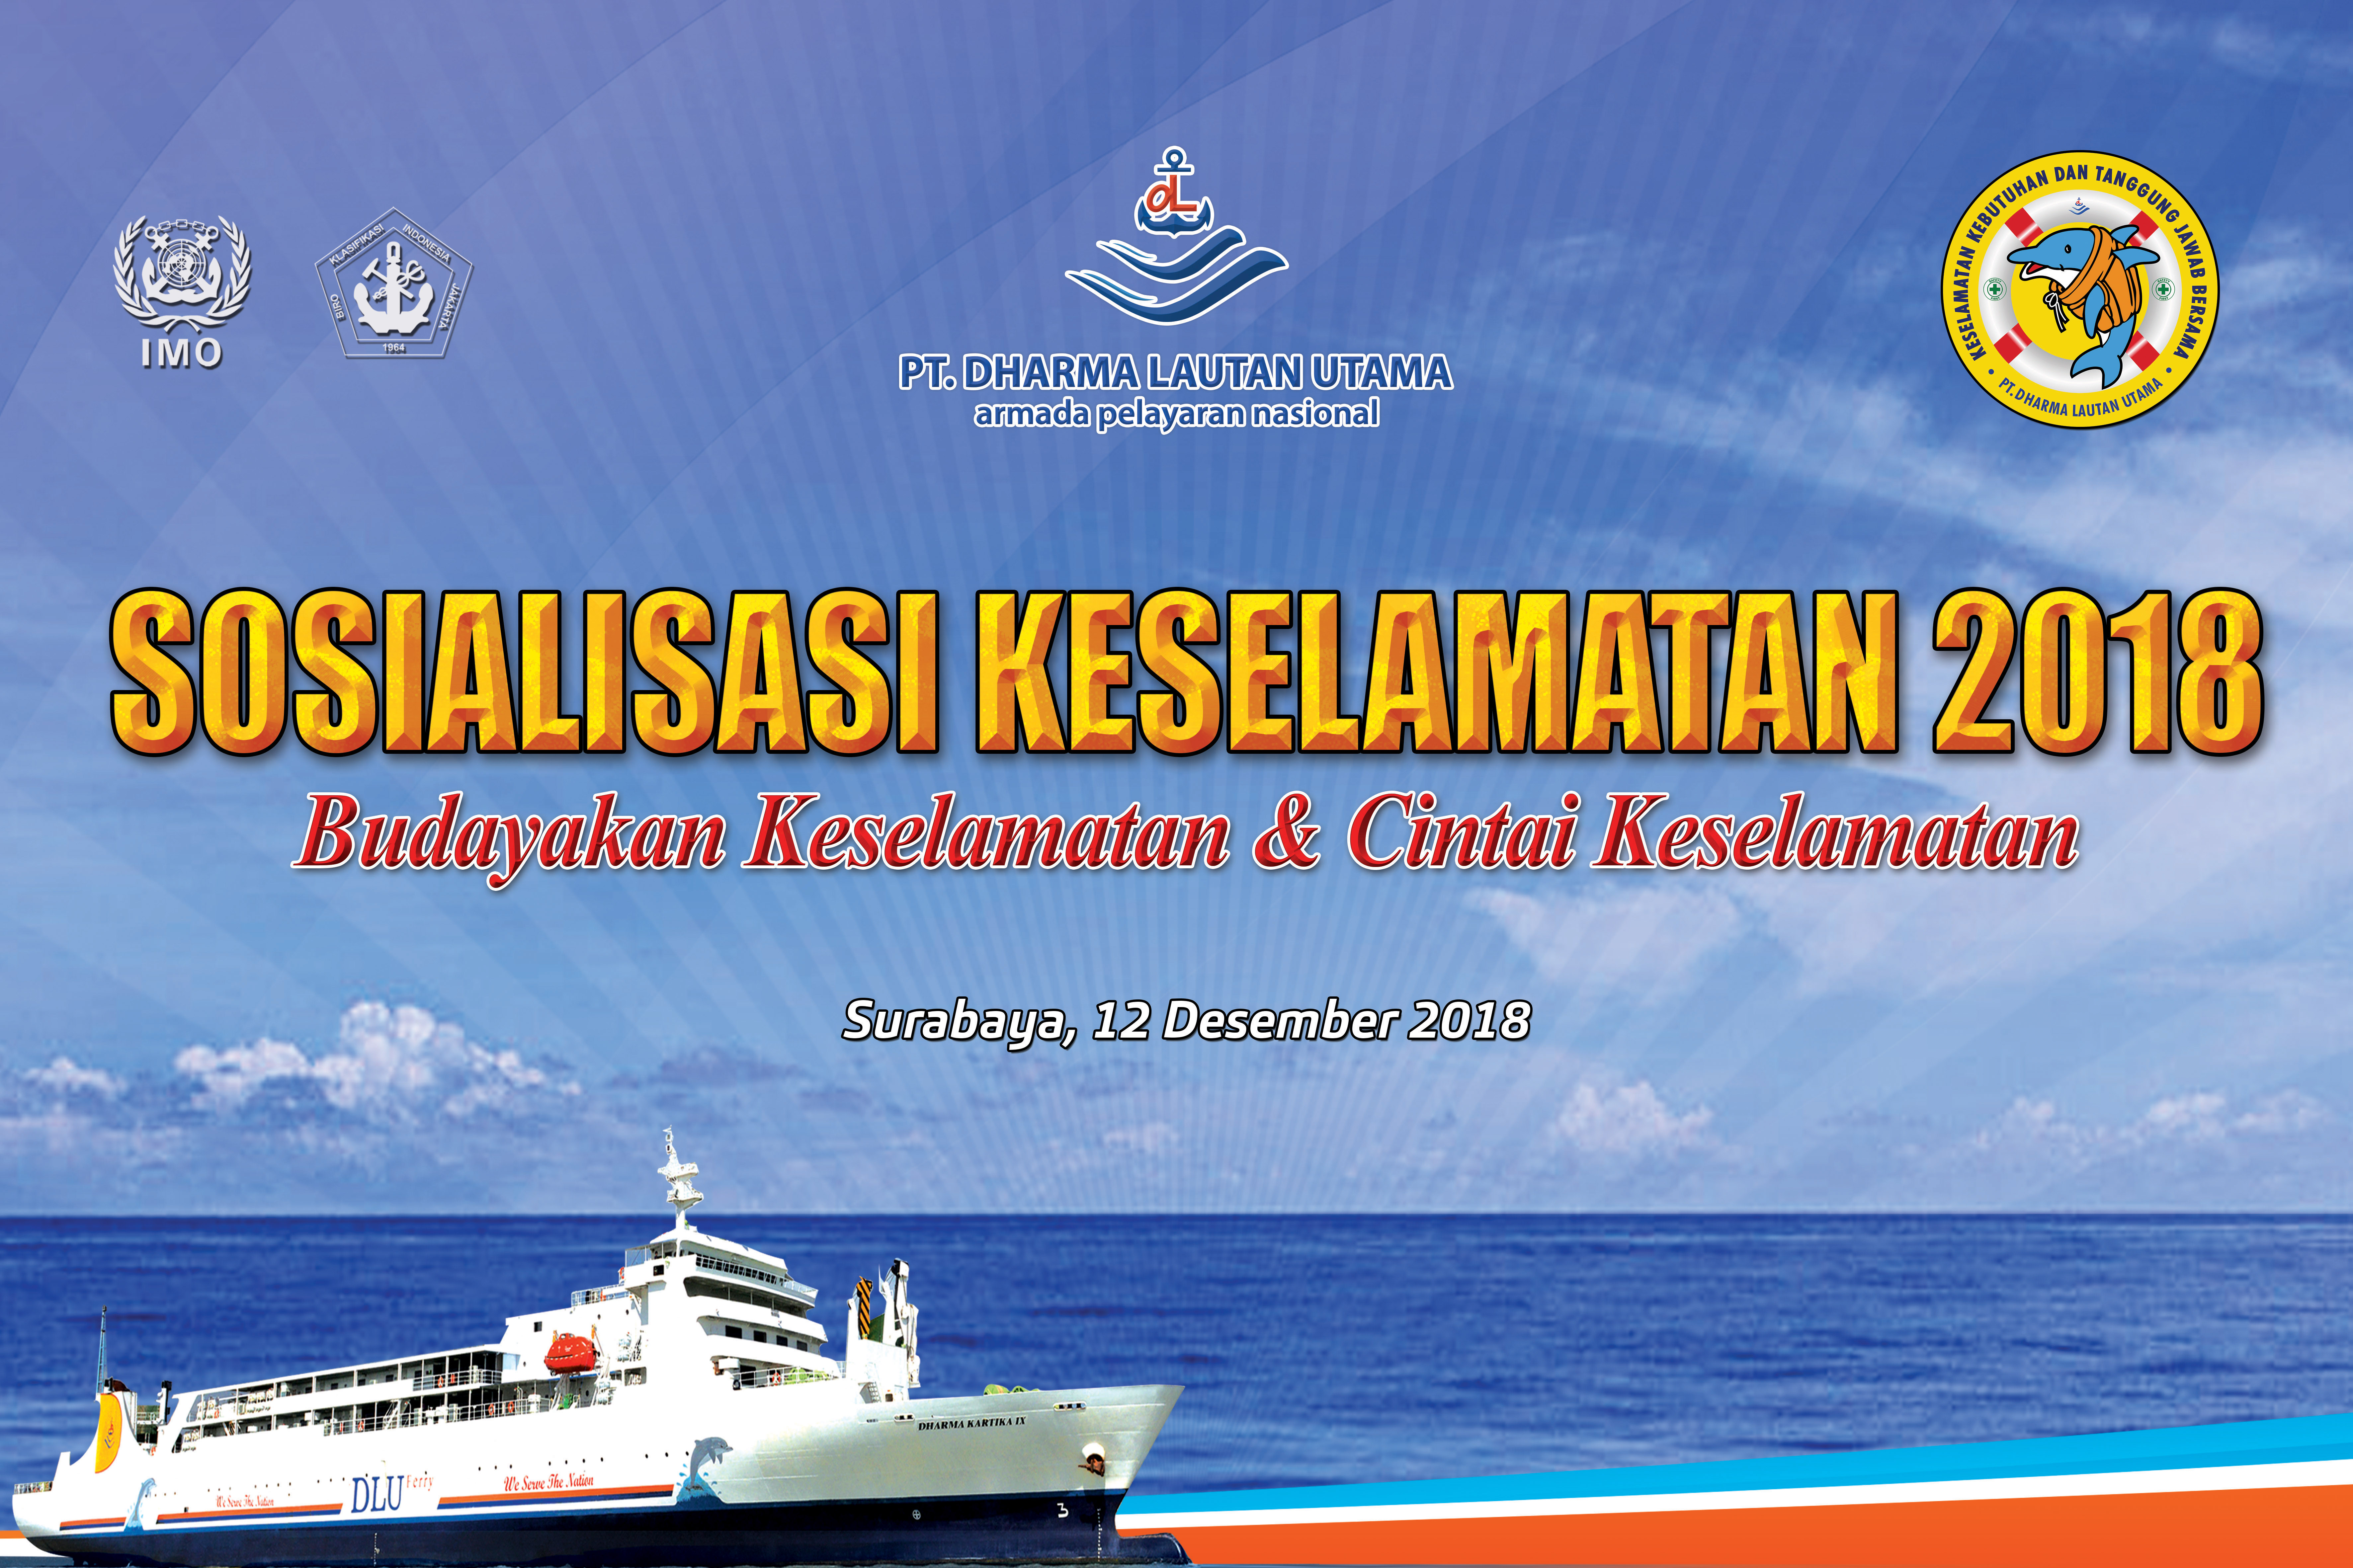 Kampanye Keselamatan PT. Dharma Lautan Utama adakan di 3 Kota